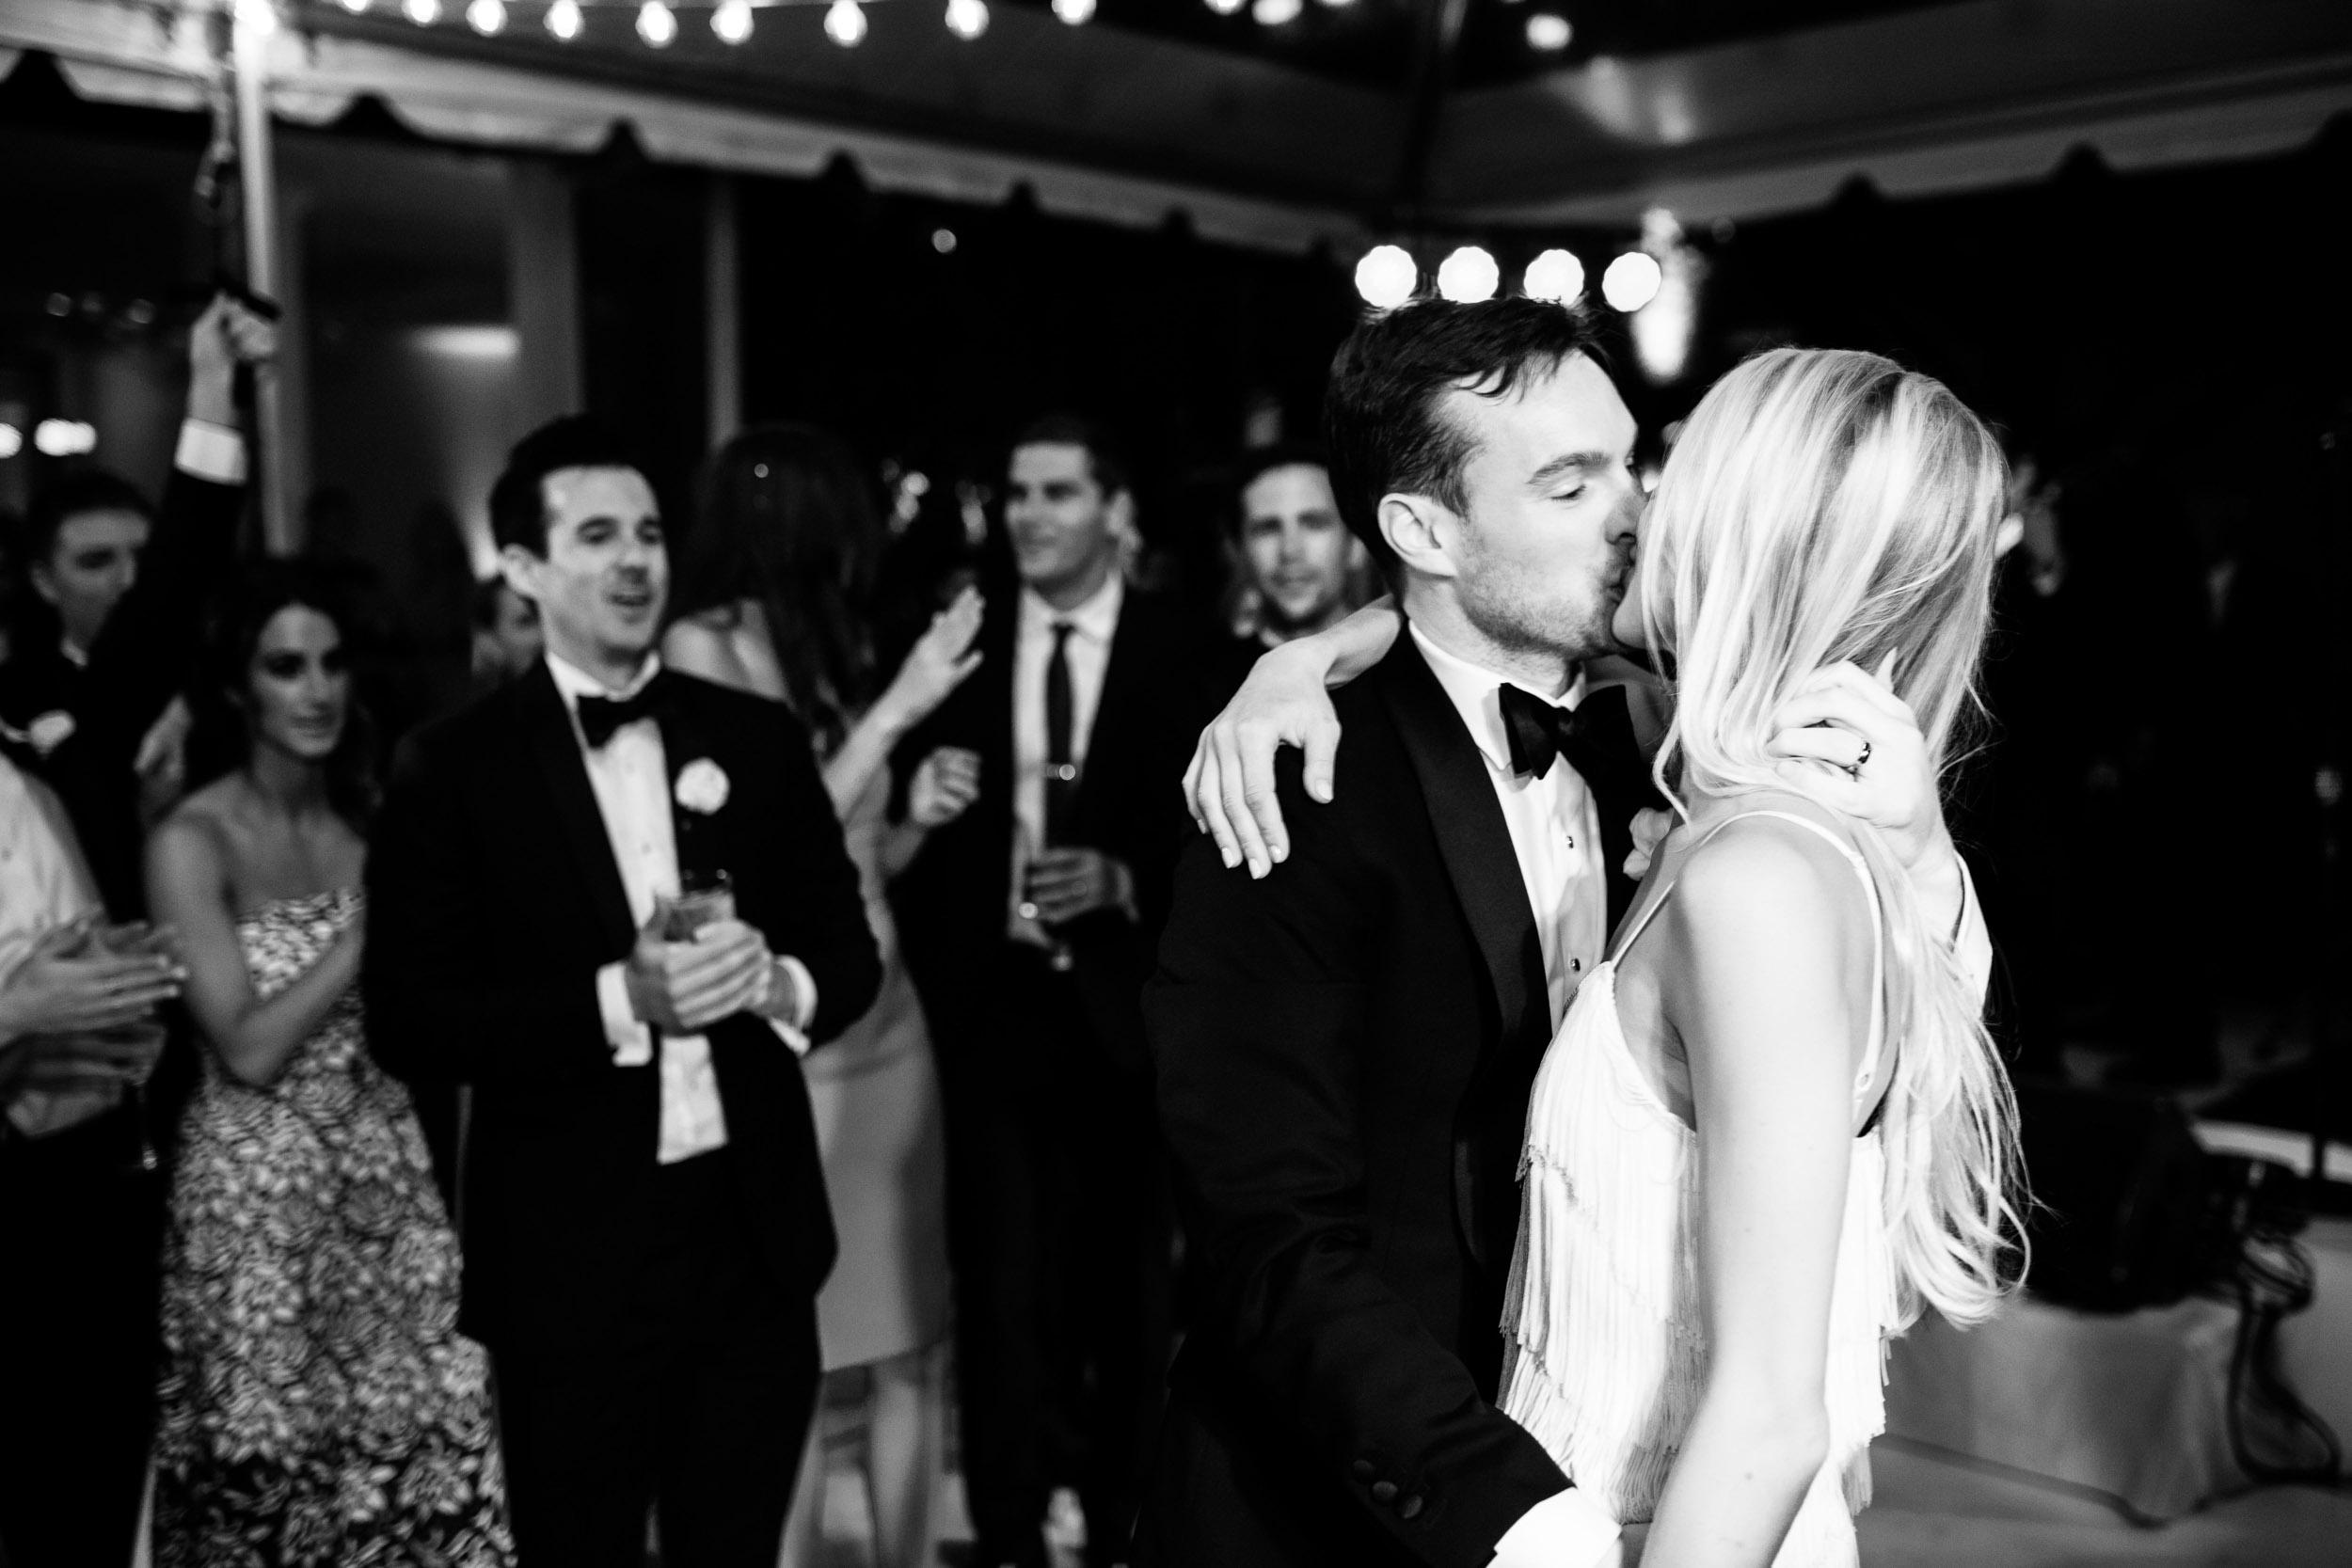 chicago-illuminating-co-wedding-photos-77.jpg